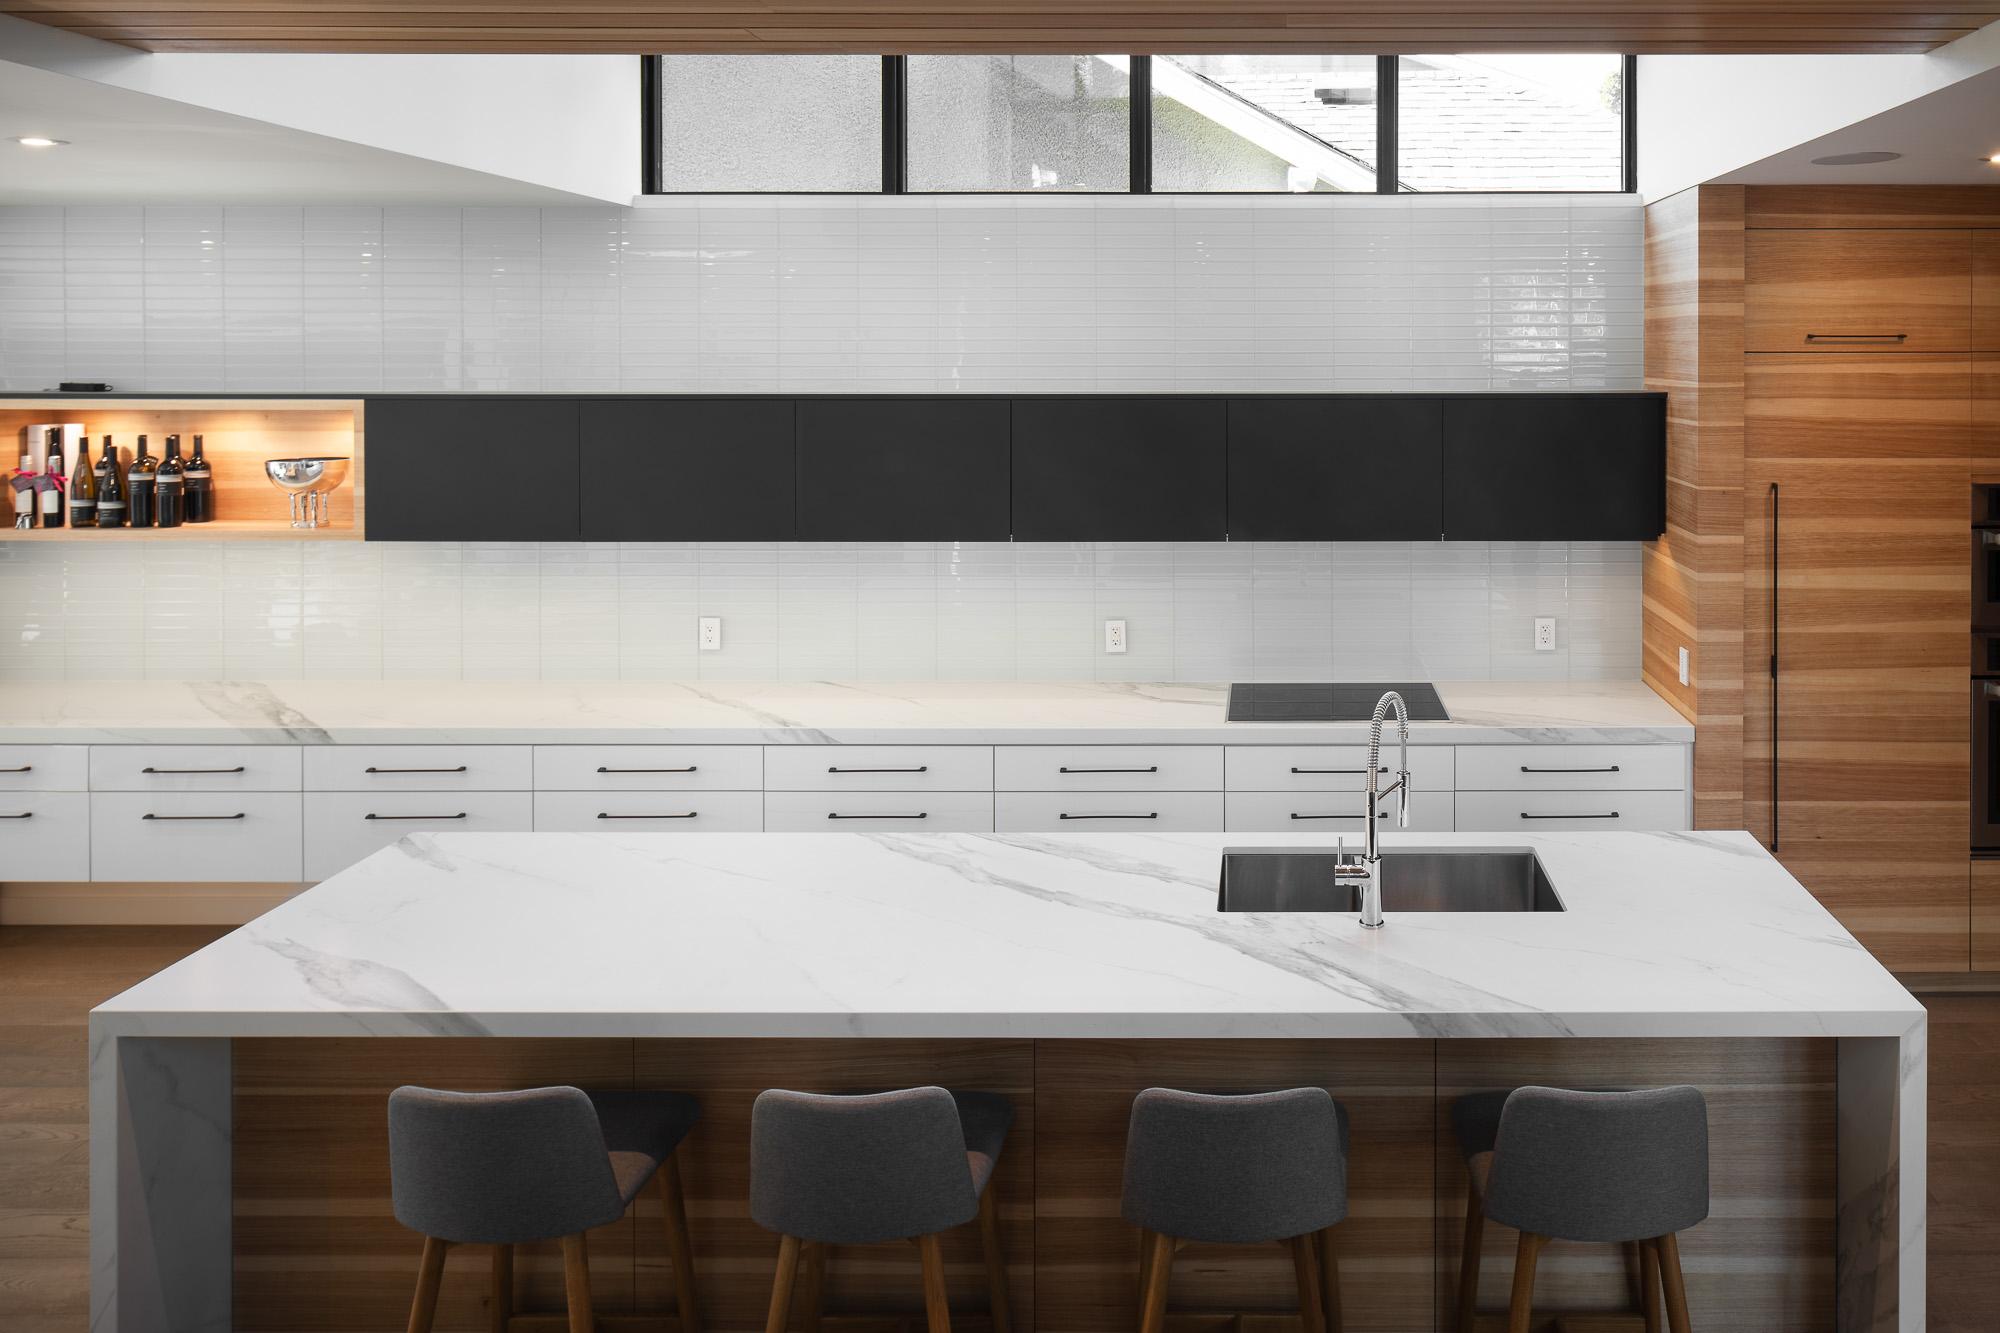 Image of 200714 WinnipegHouse 1672 Edit 7 in Designer Spotlight: Winnipeg's Secter Architecture + Design - Cosentino